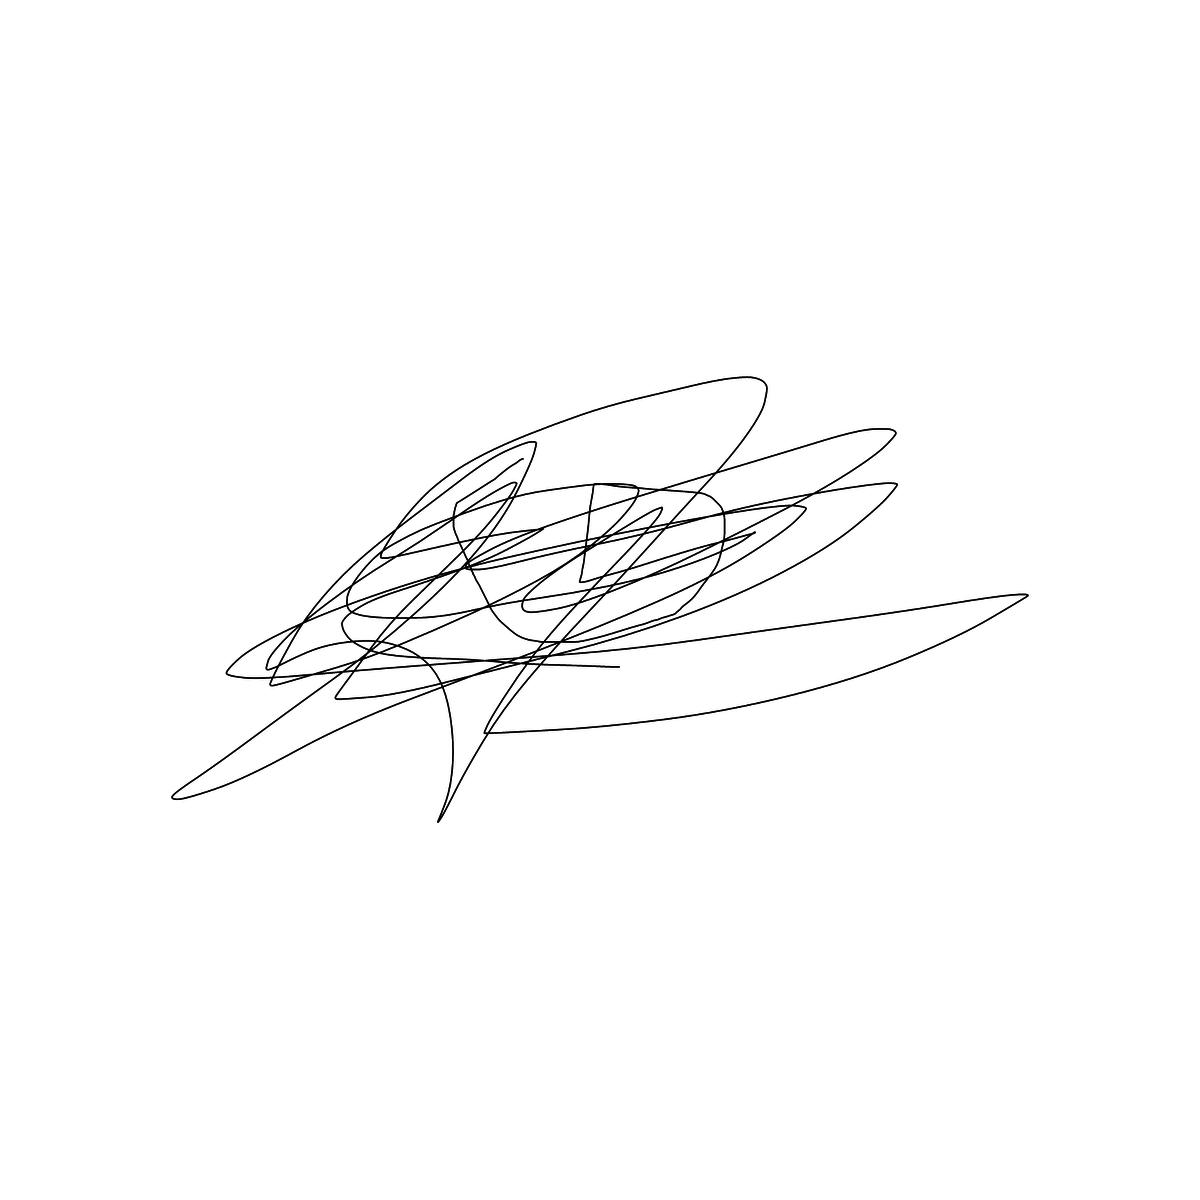 BAAAM drawing#14613 lat:52.3724098205566400lng: 4.9491744041442870